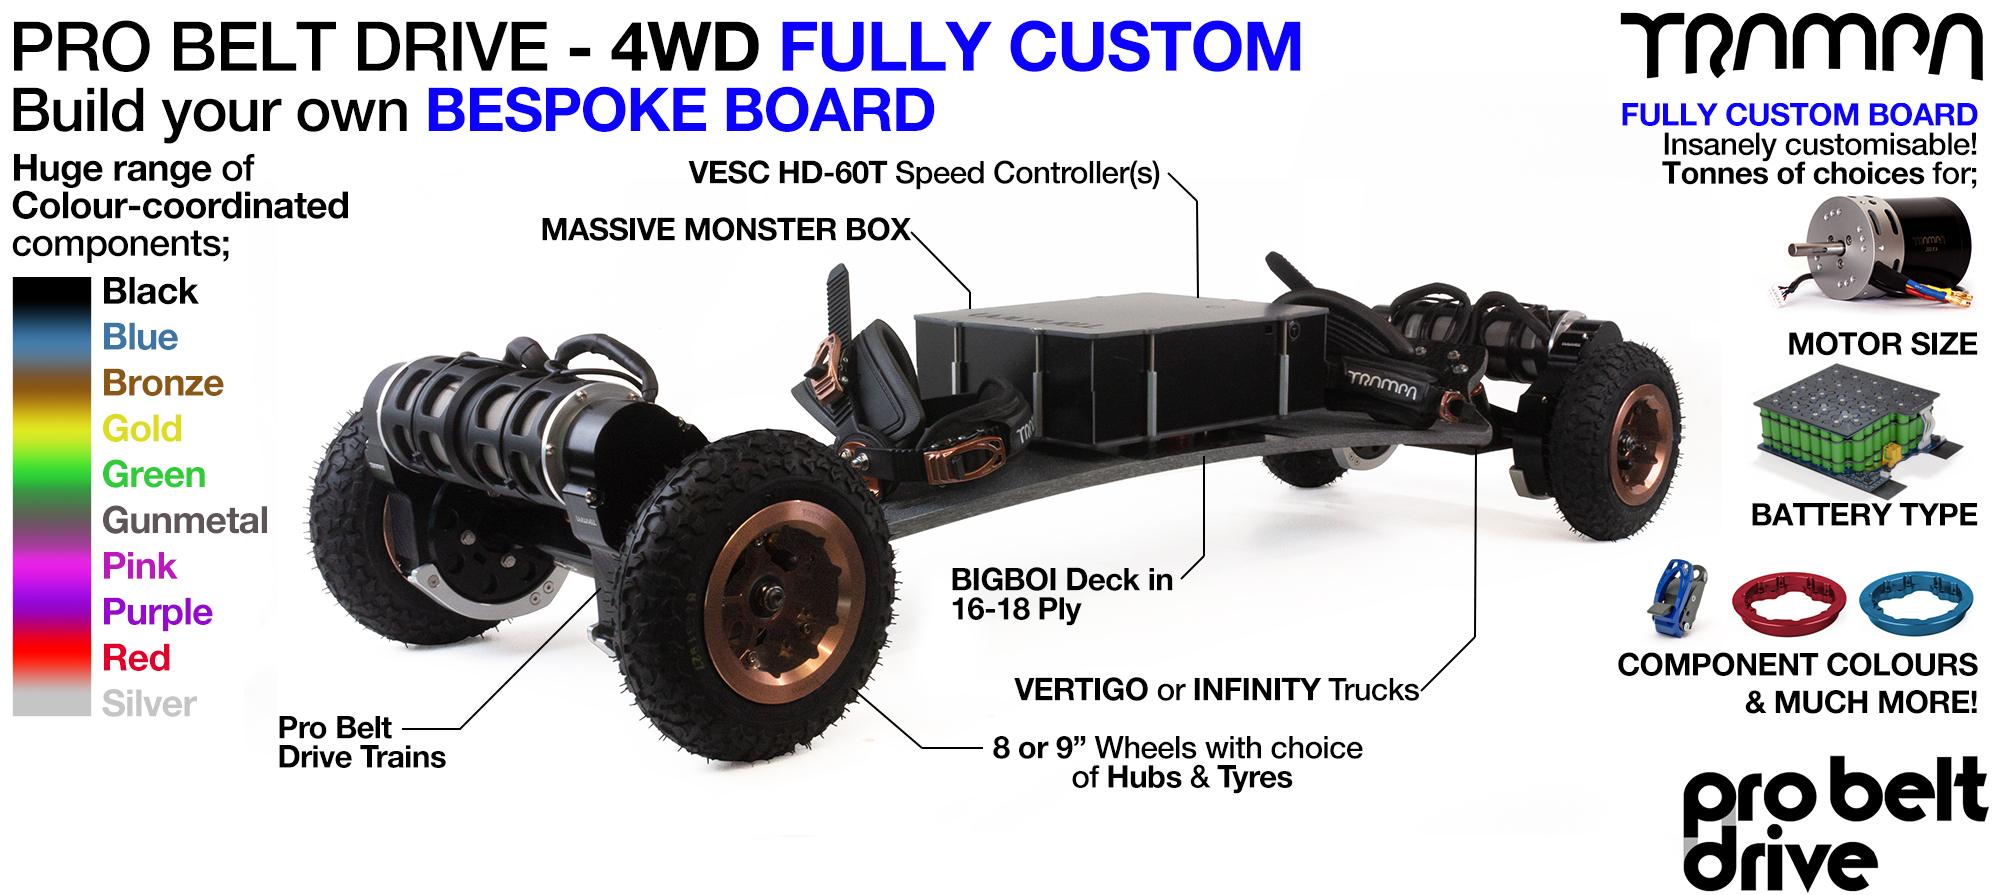 4WD PRO BELT DRIVE BIGBOI Electric TRAMPA Mountainboard - CUSTOM